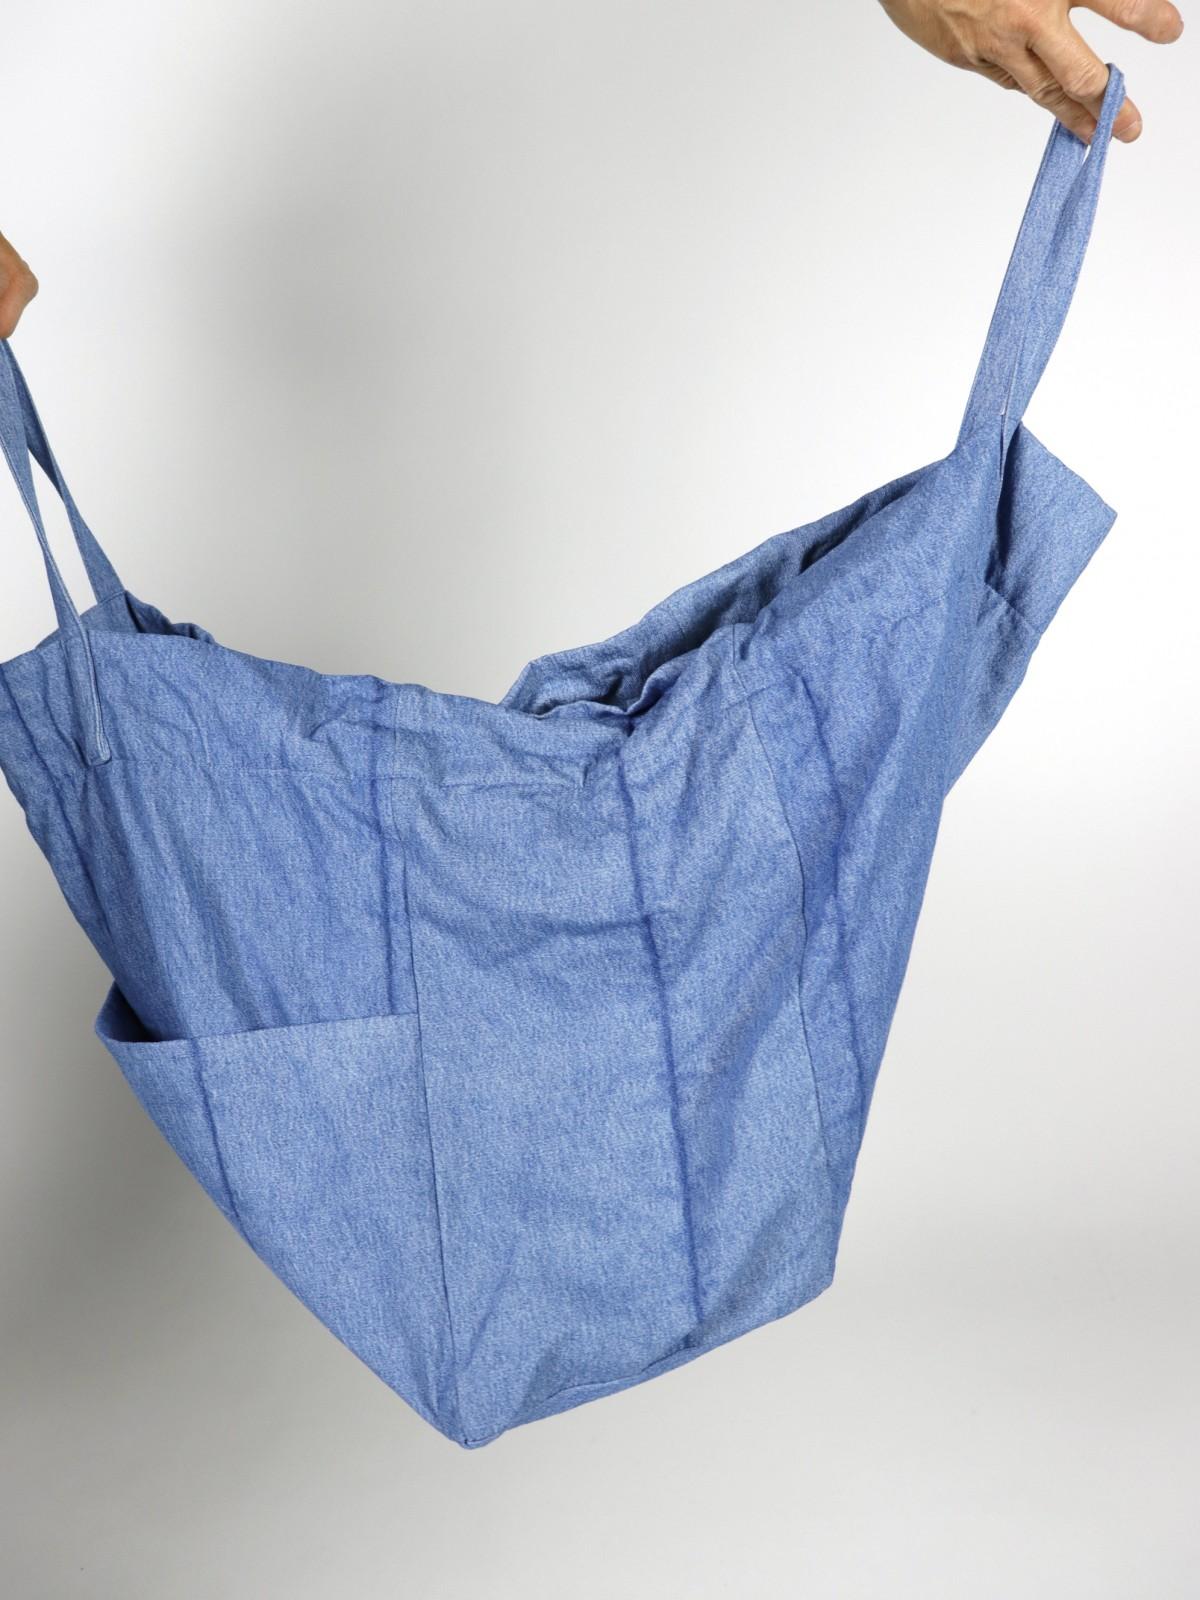 ralph lauren, brown.remake, bag, denim fabric